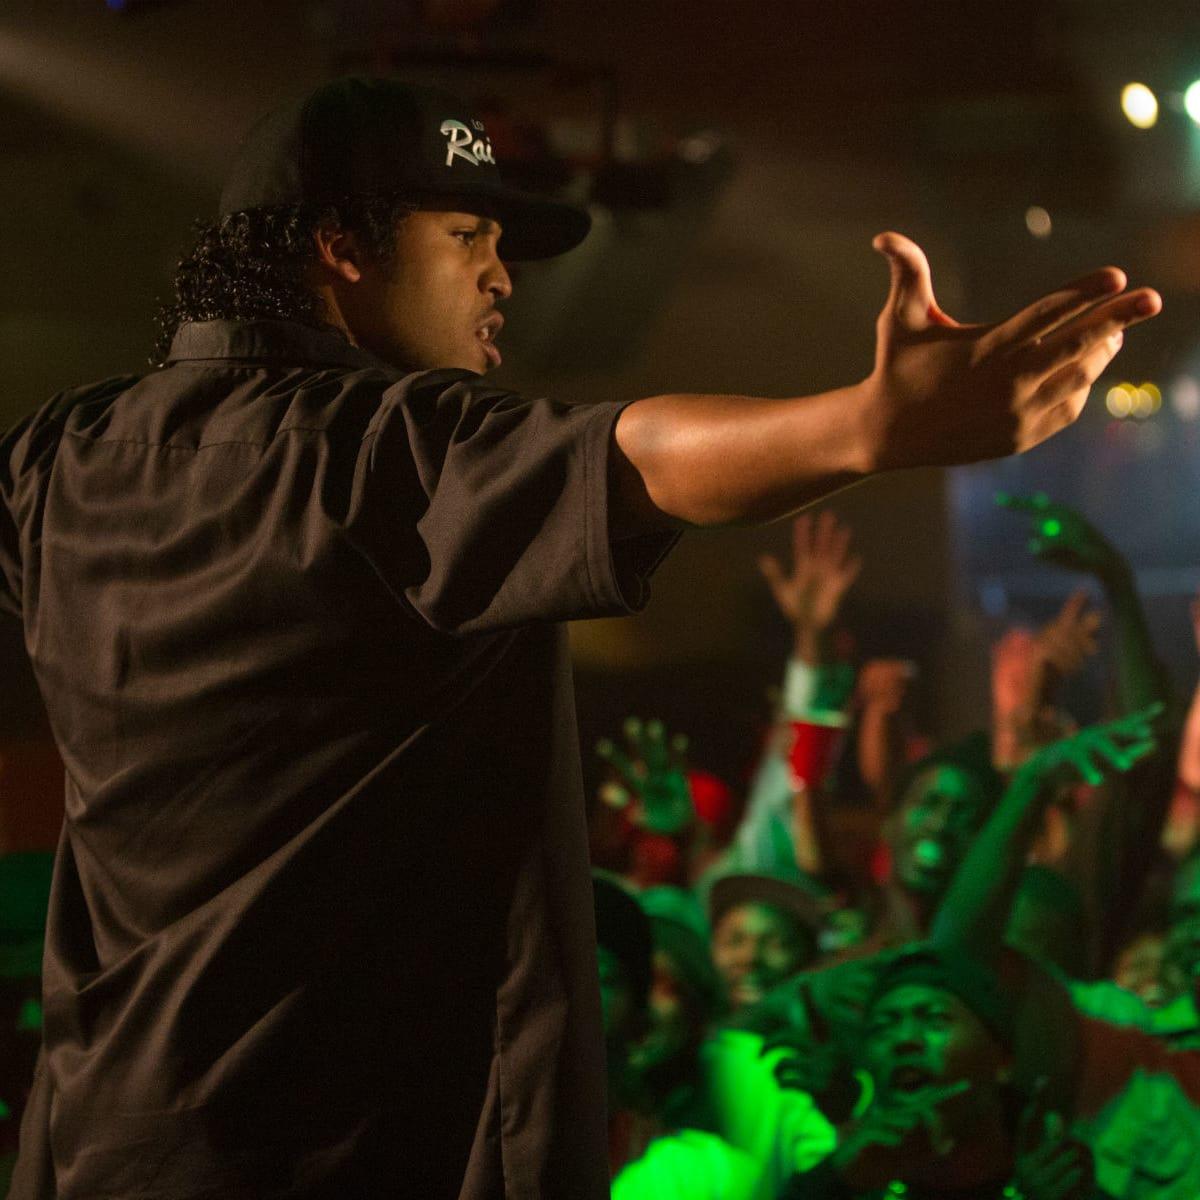 O'Shea Jackson Jr. in Straight Outta Compton